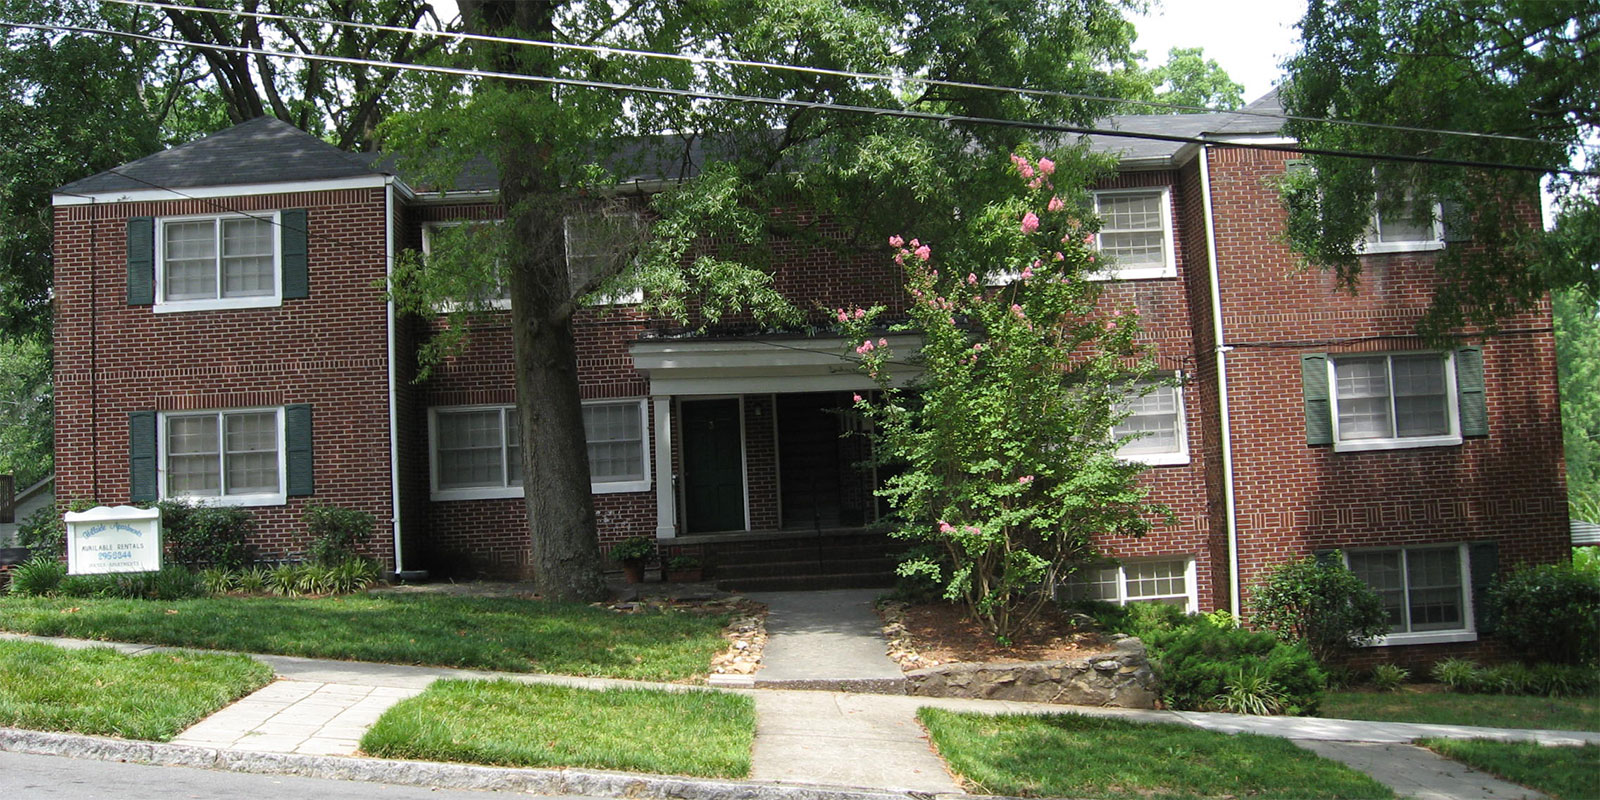 407-1 E 4th Avenue, Rome, Georgia 30161, 1 Bedroom Bedrooms, ,1 BathroomBathrooms,Apartment,Rental,E 4th Avenue,1056